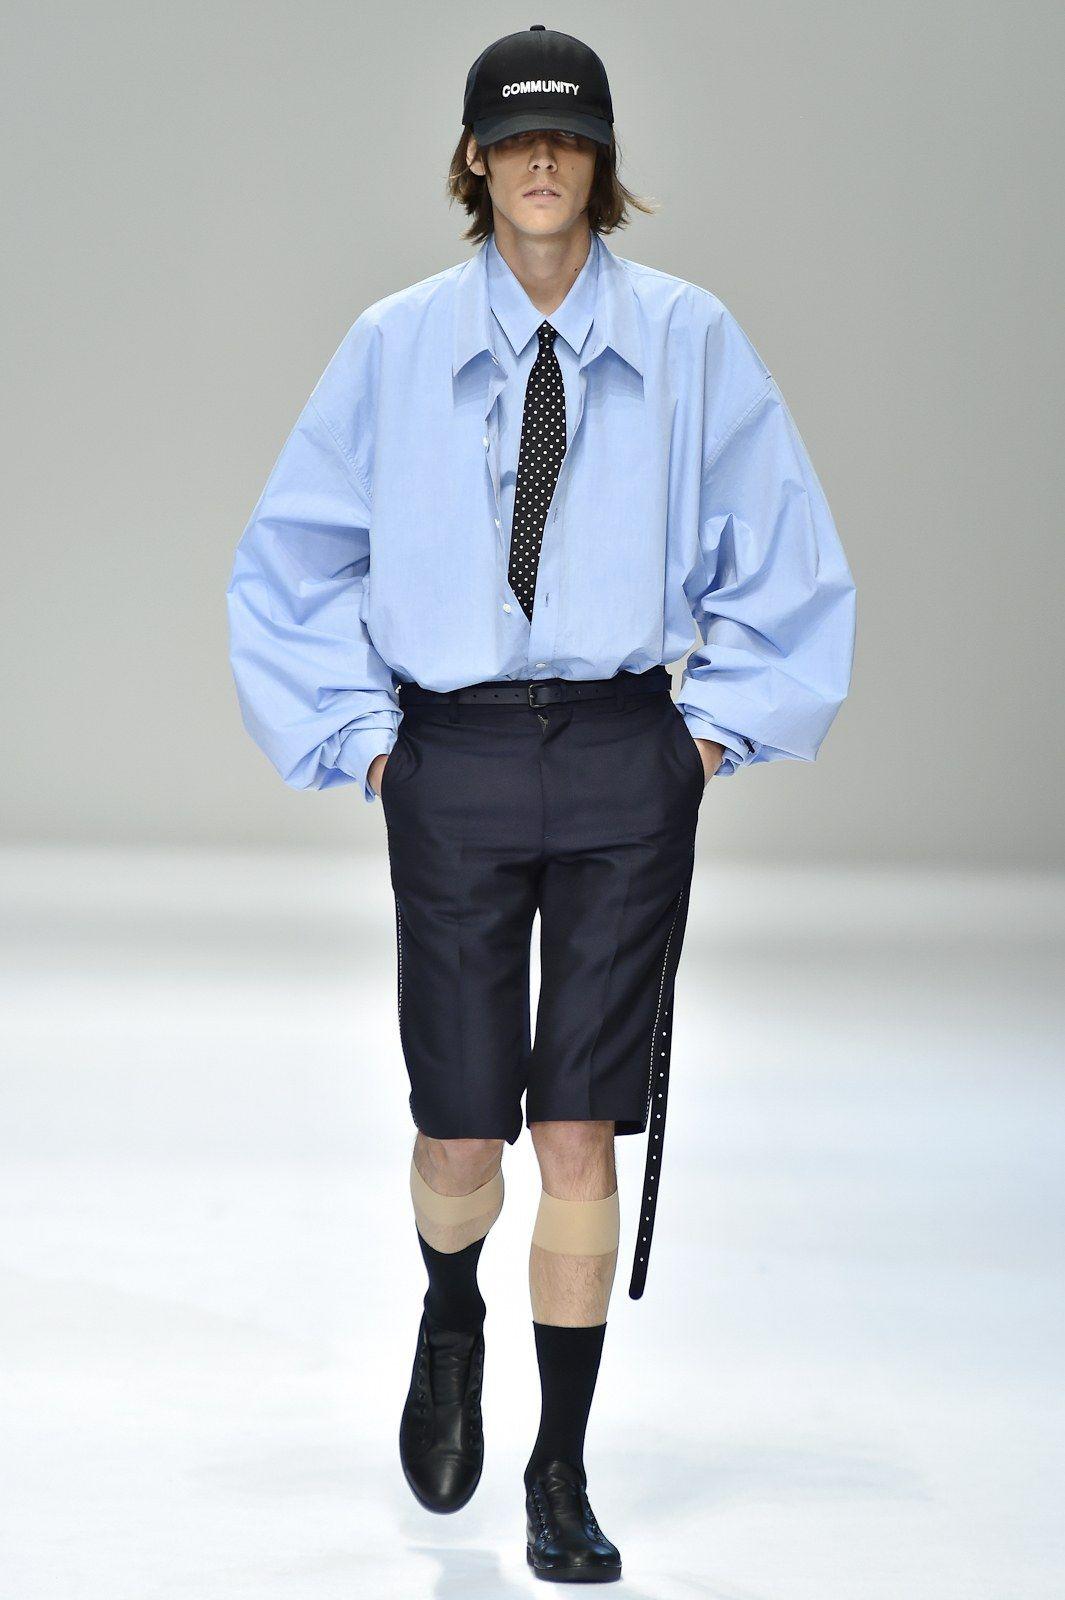 Shirt design for man 2017 - Dressedundressed Tokyo Spring 2017 Fashion Show Men Fashionfashion Designfashion